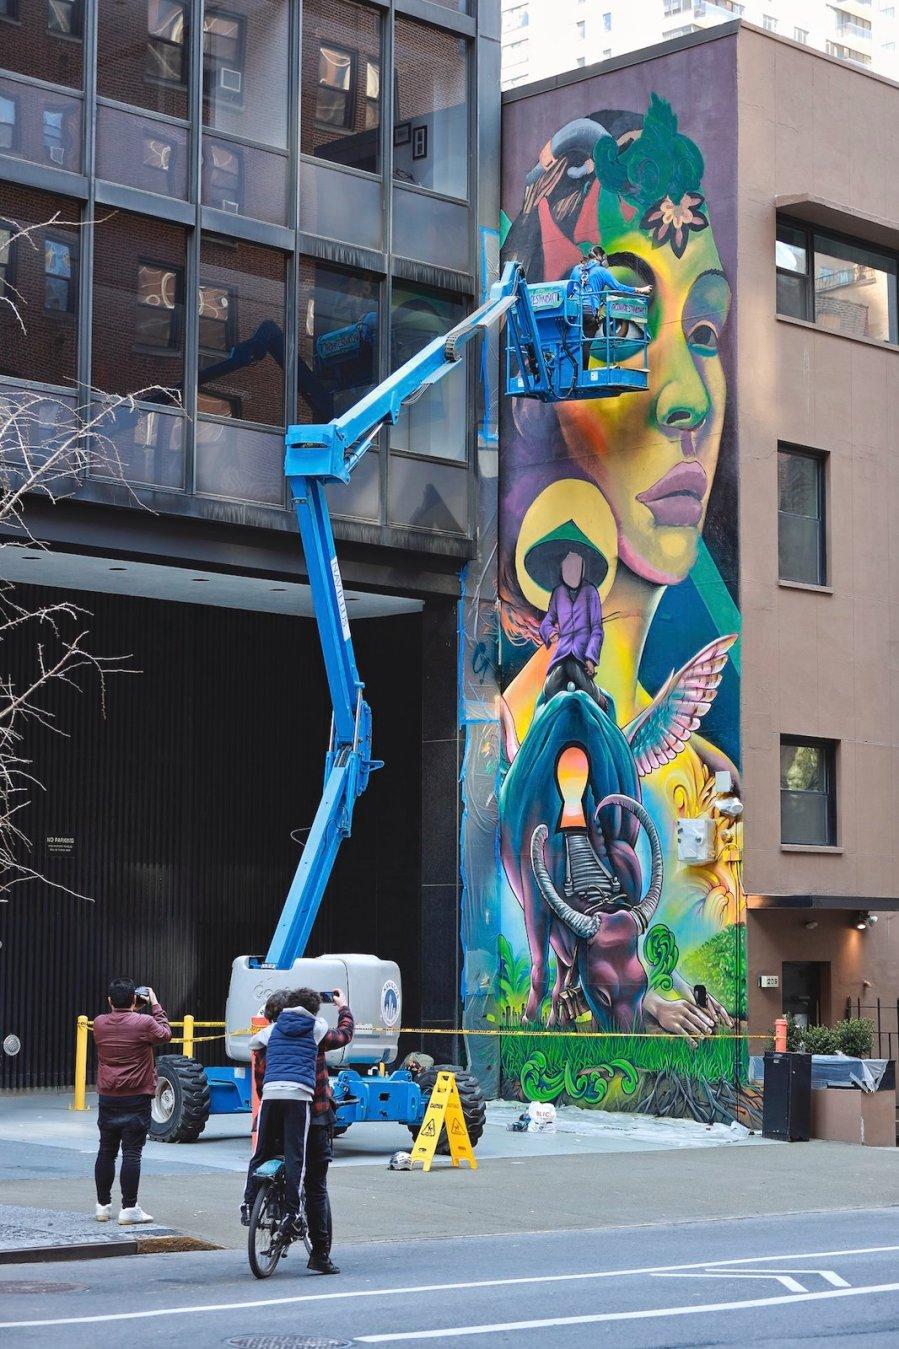 ILO-art-walk-100-street-art-manhattan-pc-just-a-spectator-2